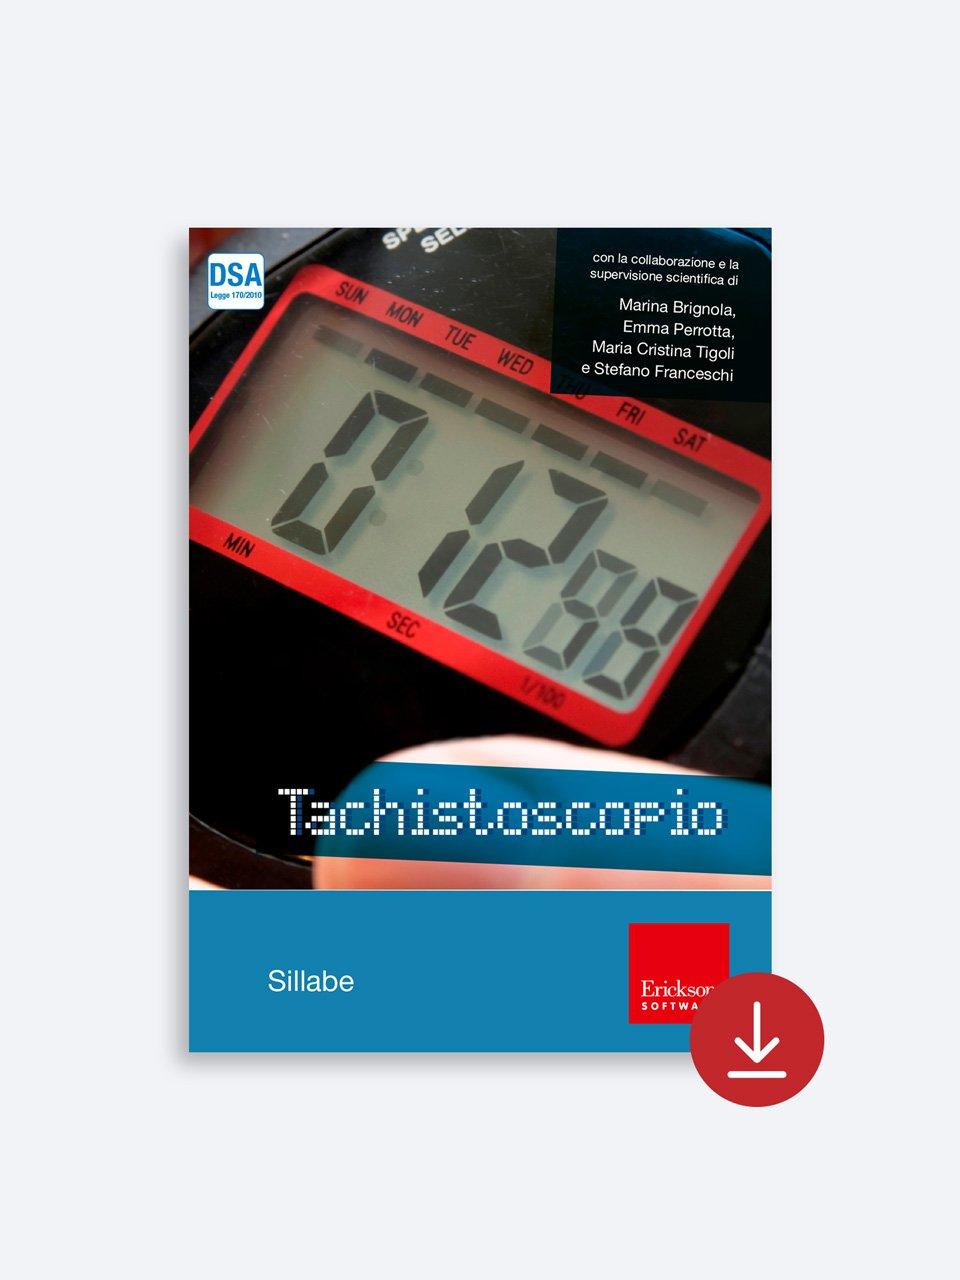 Tachistoscopio SUITE - App e software - Erickson 4